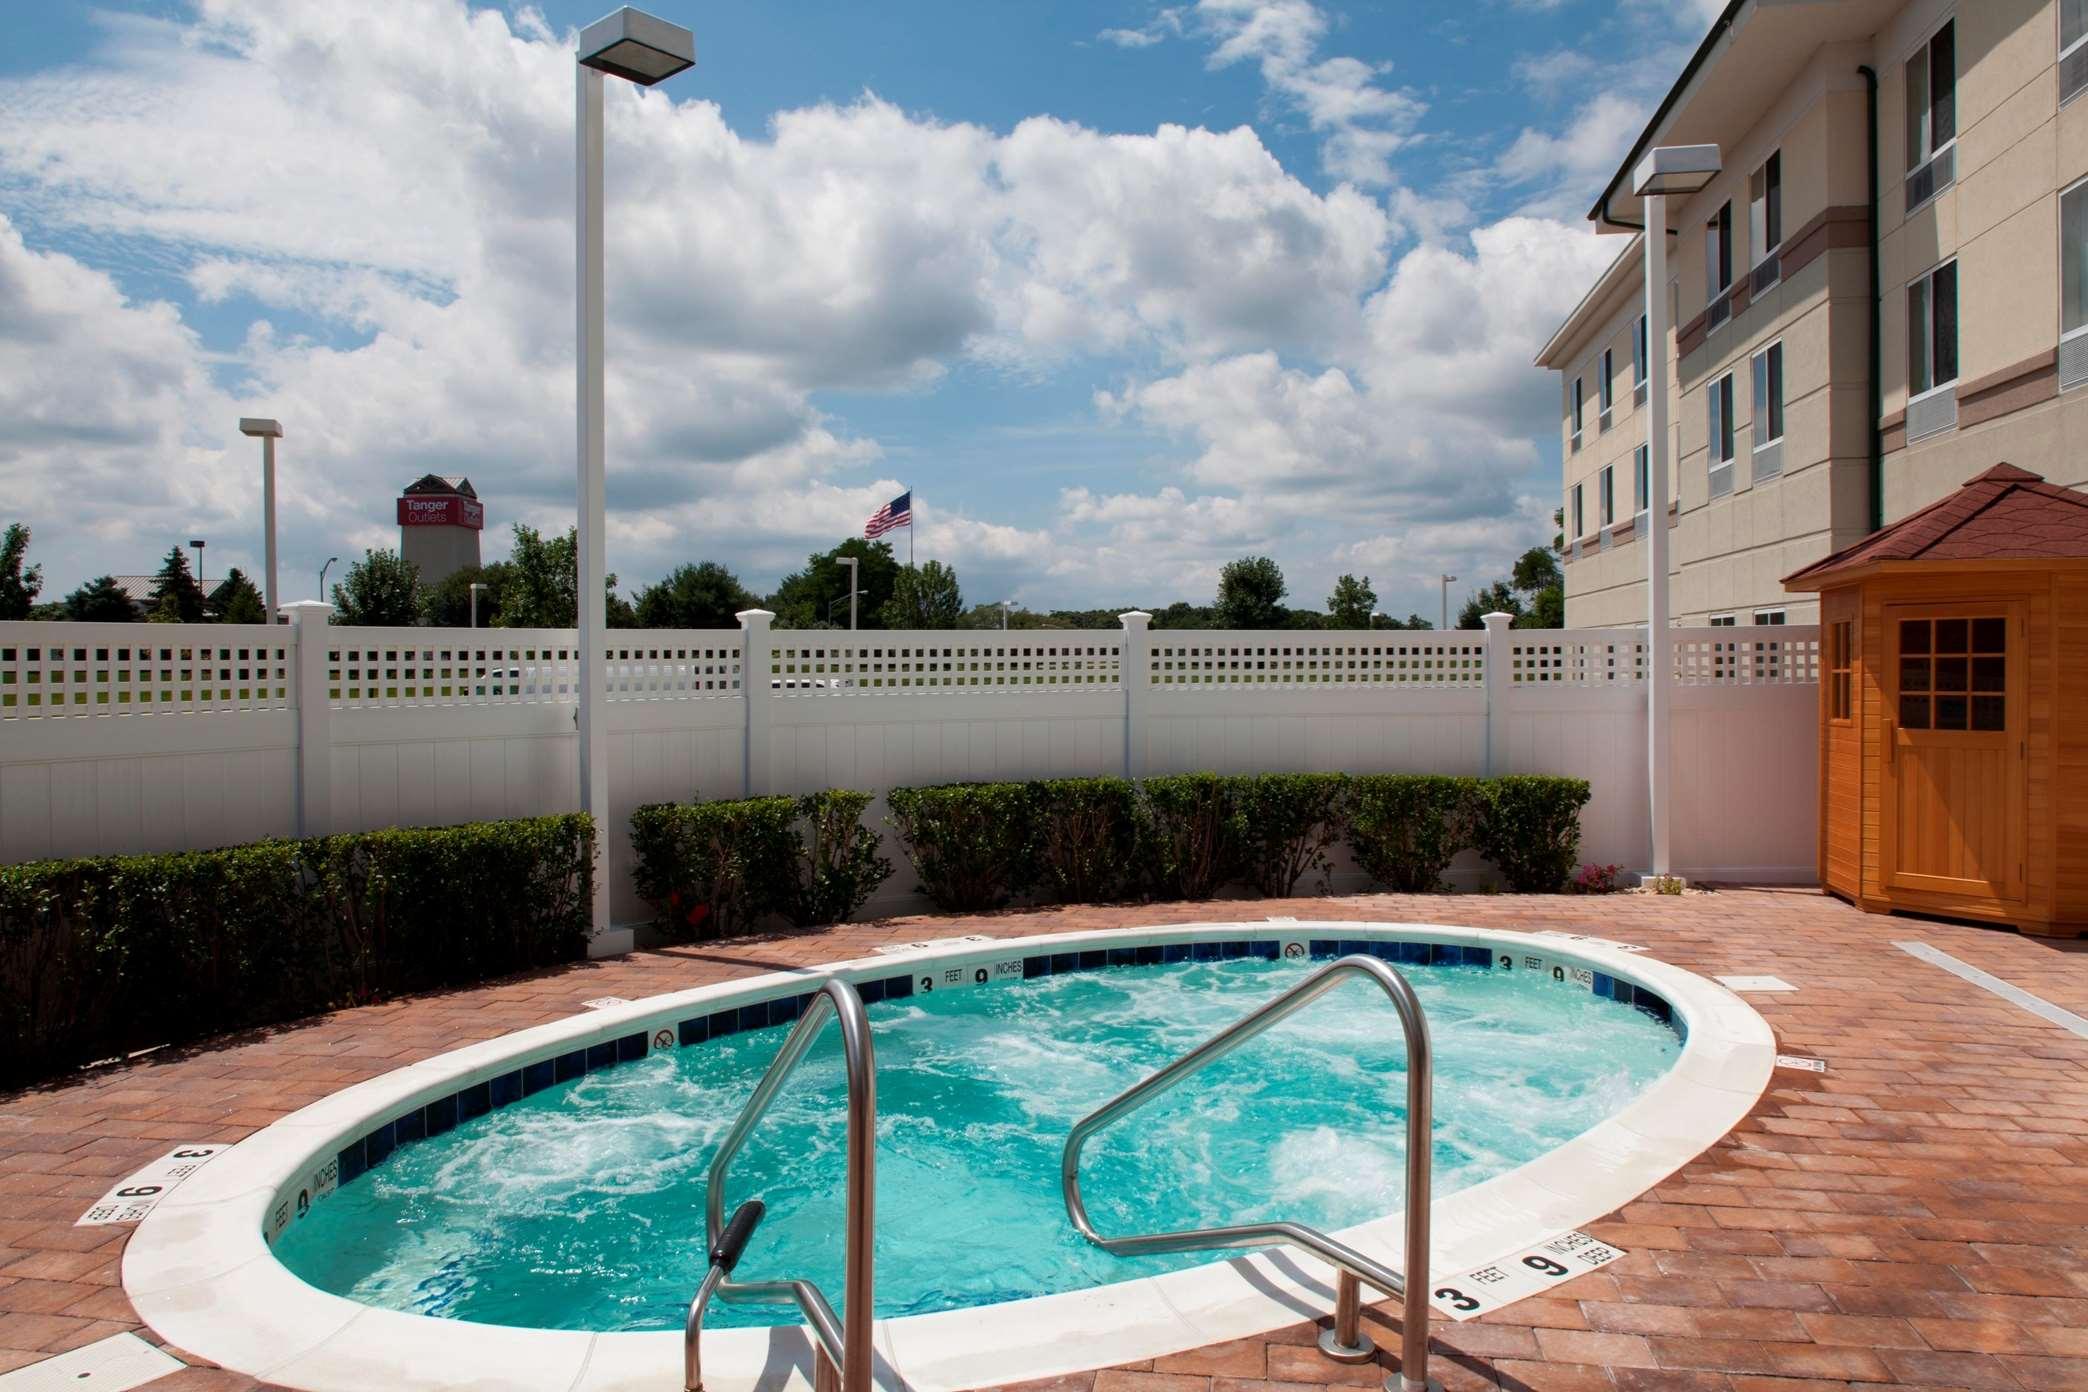 Hilton Garden Inn Riverhead Riverhead New York Ny